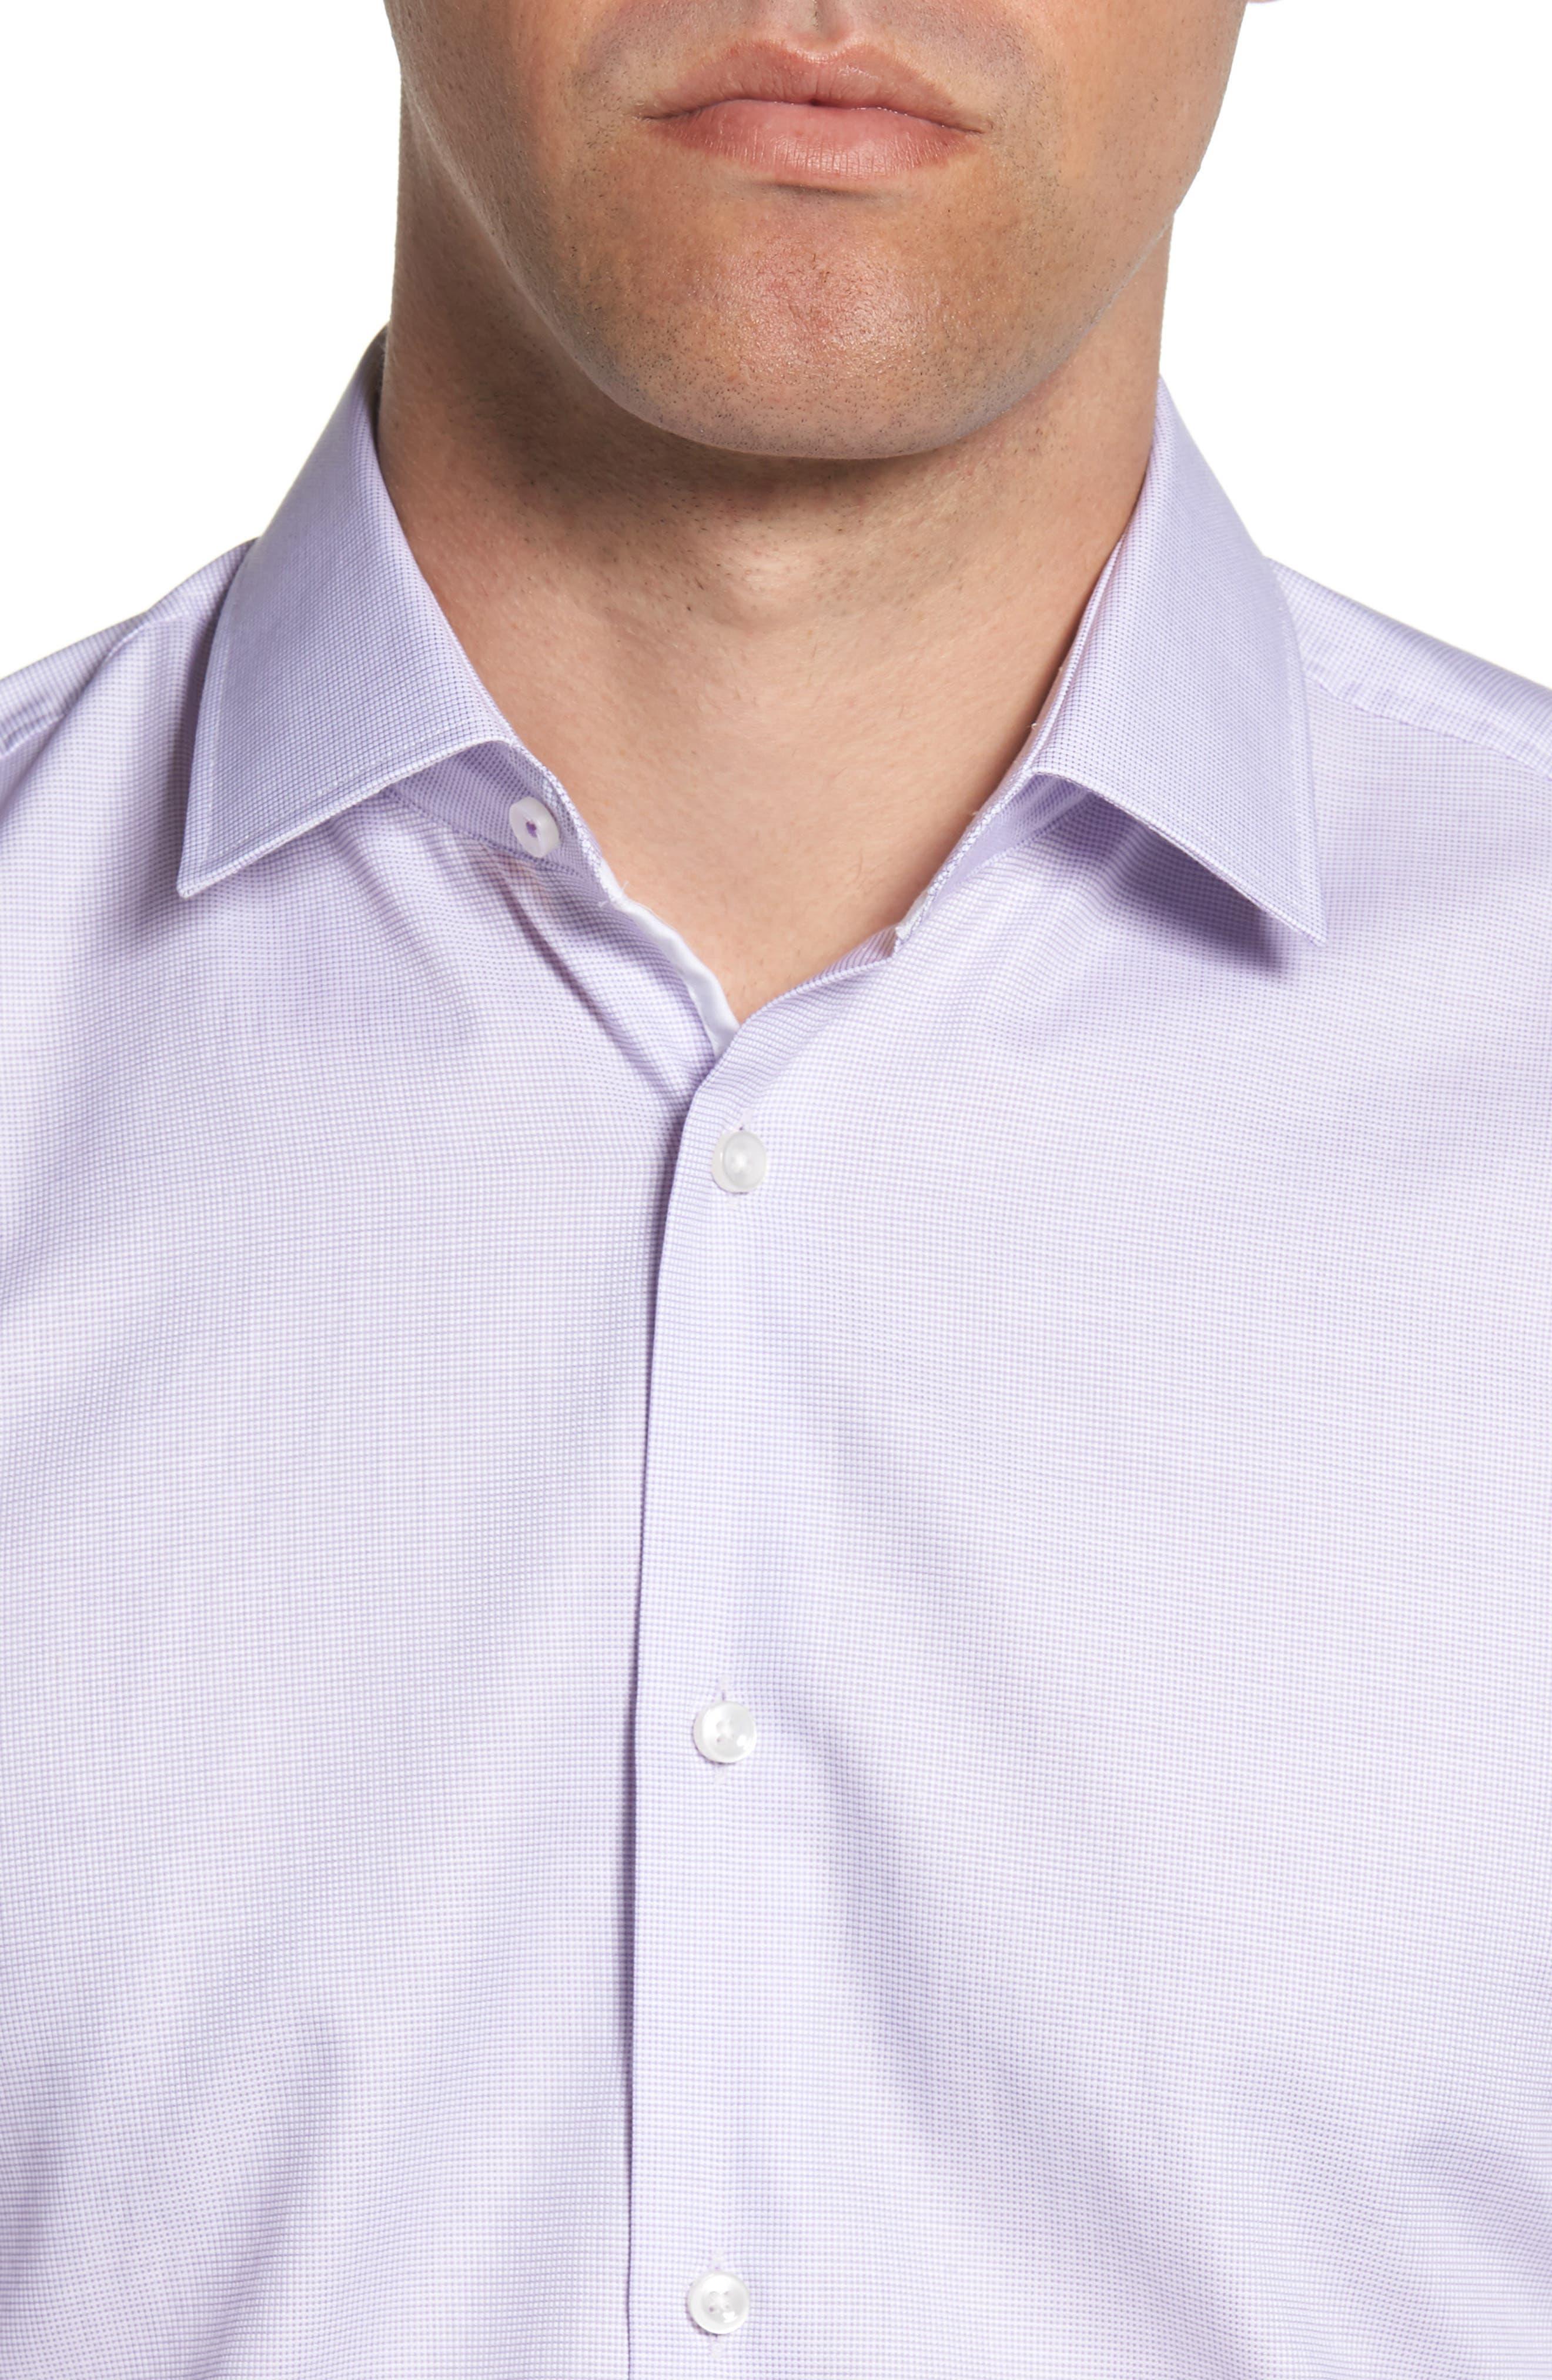 Jesse Slim Fit Dress Shirt,                             Alternate thumbnail 2, color,                             Purple